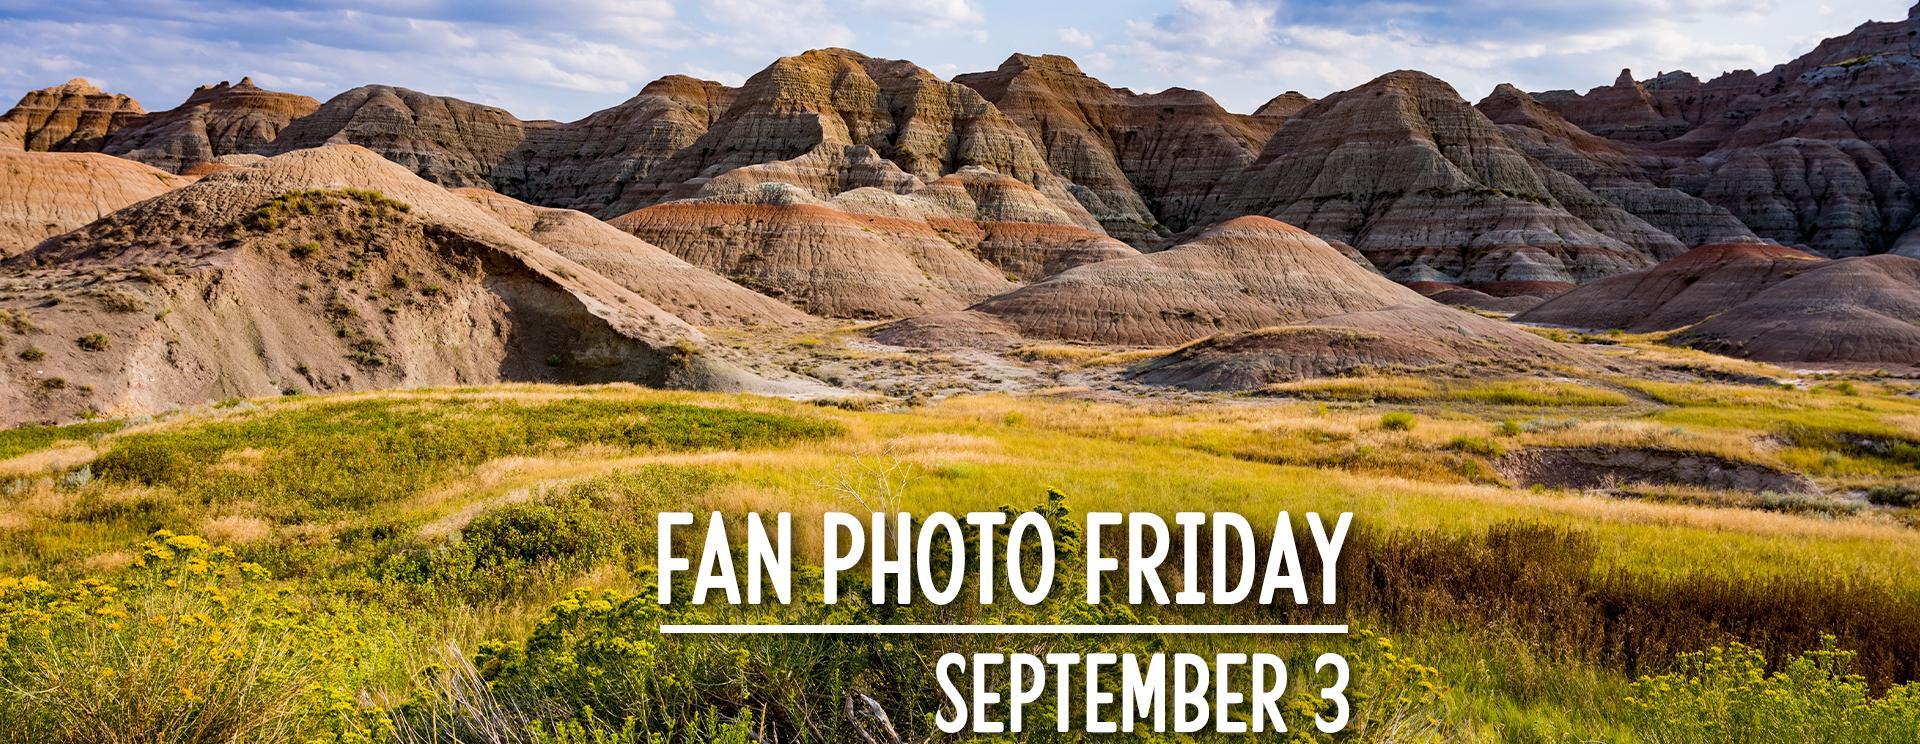 Fan Photo Friday | Sept. 3, 2021